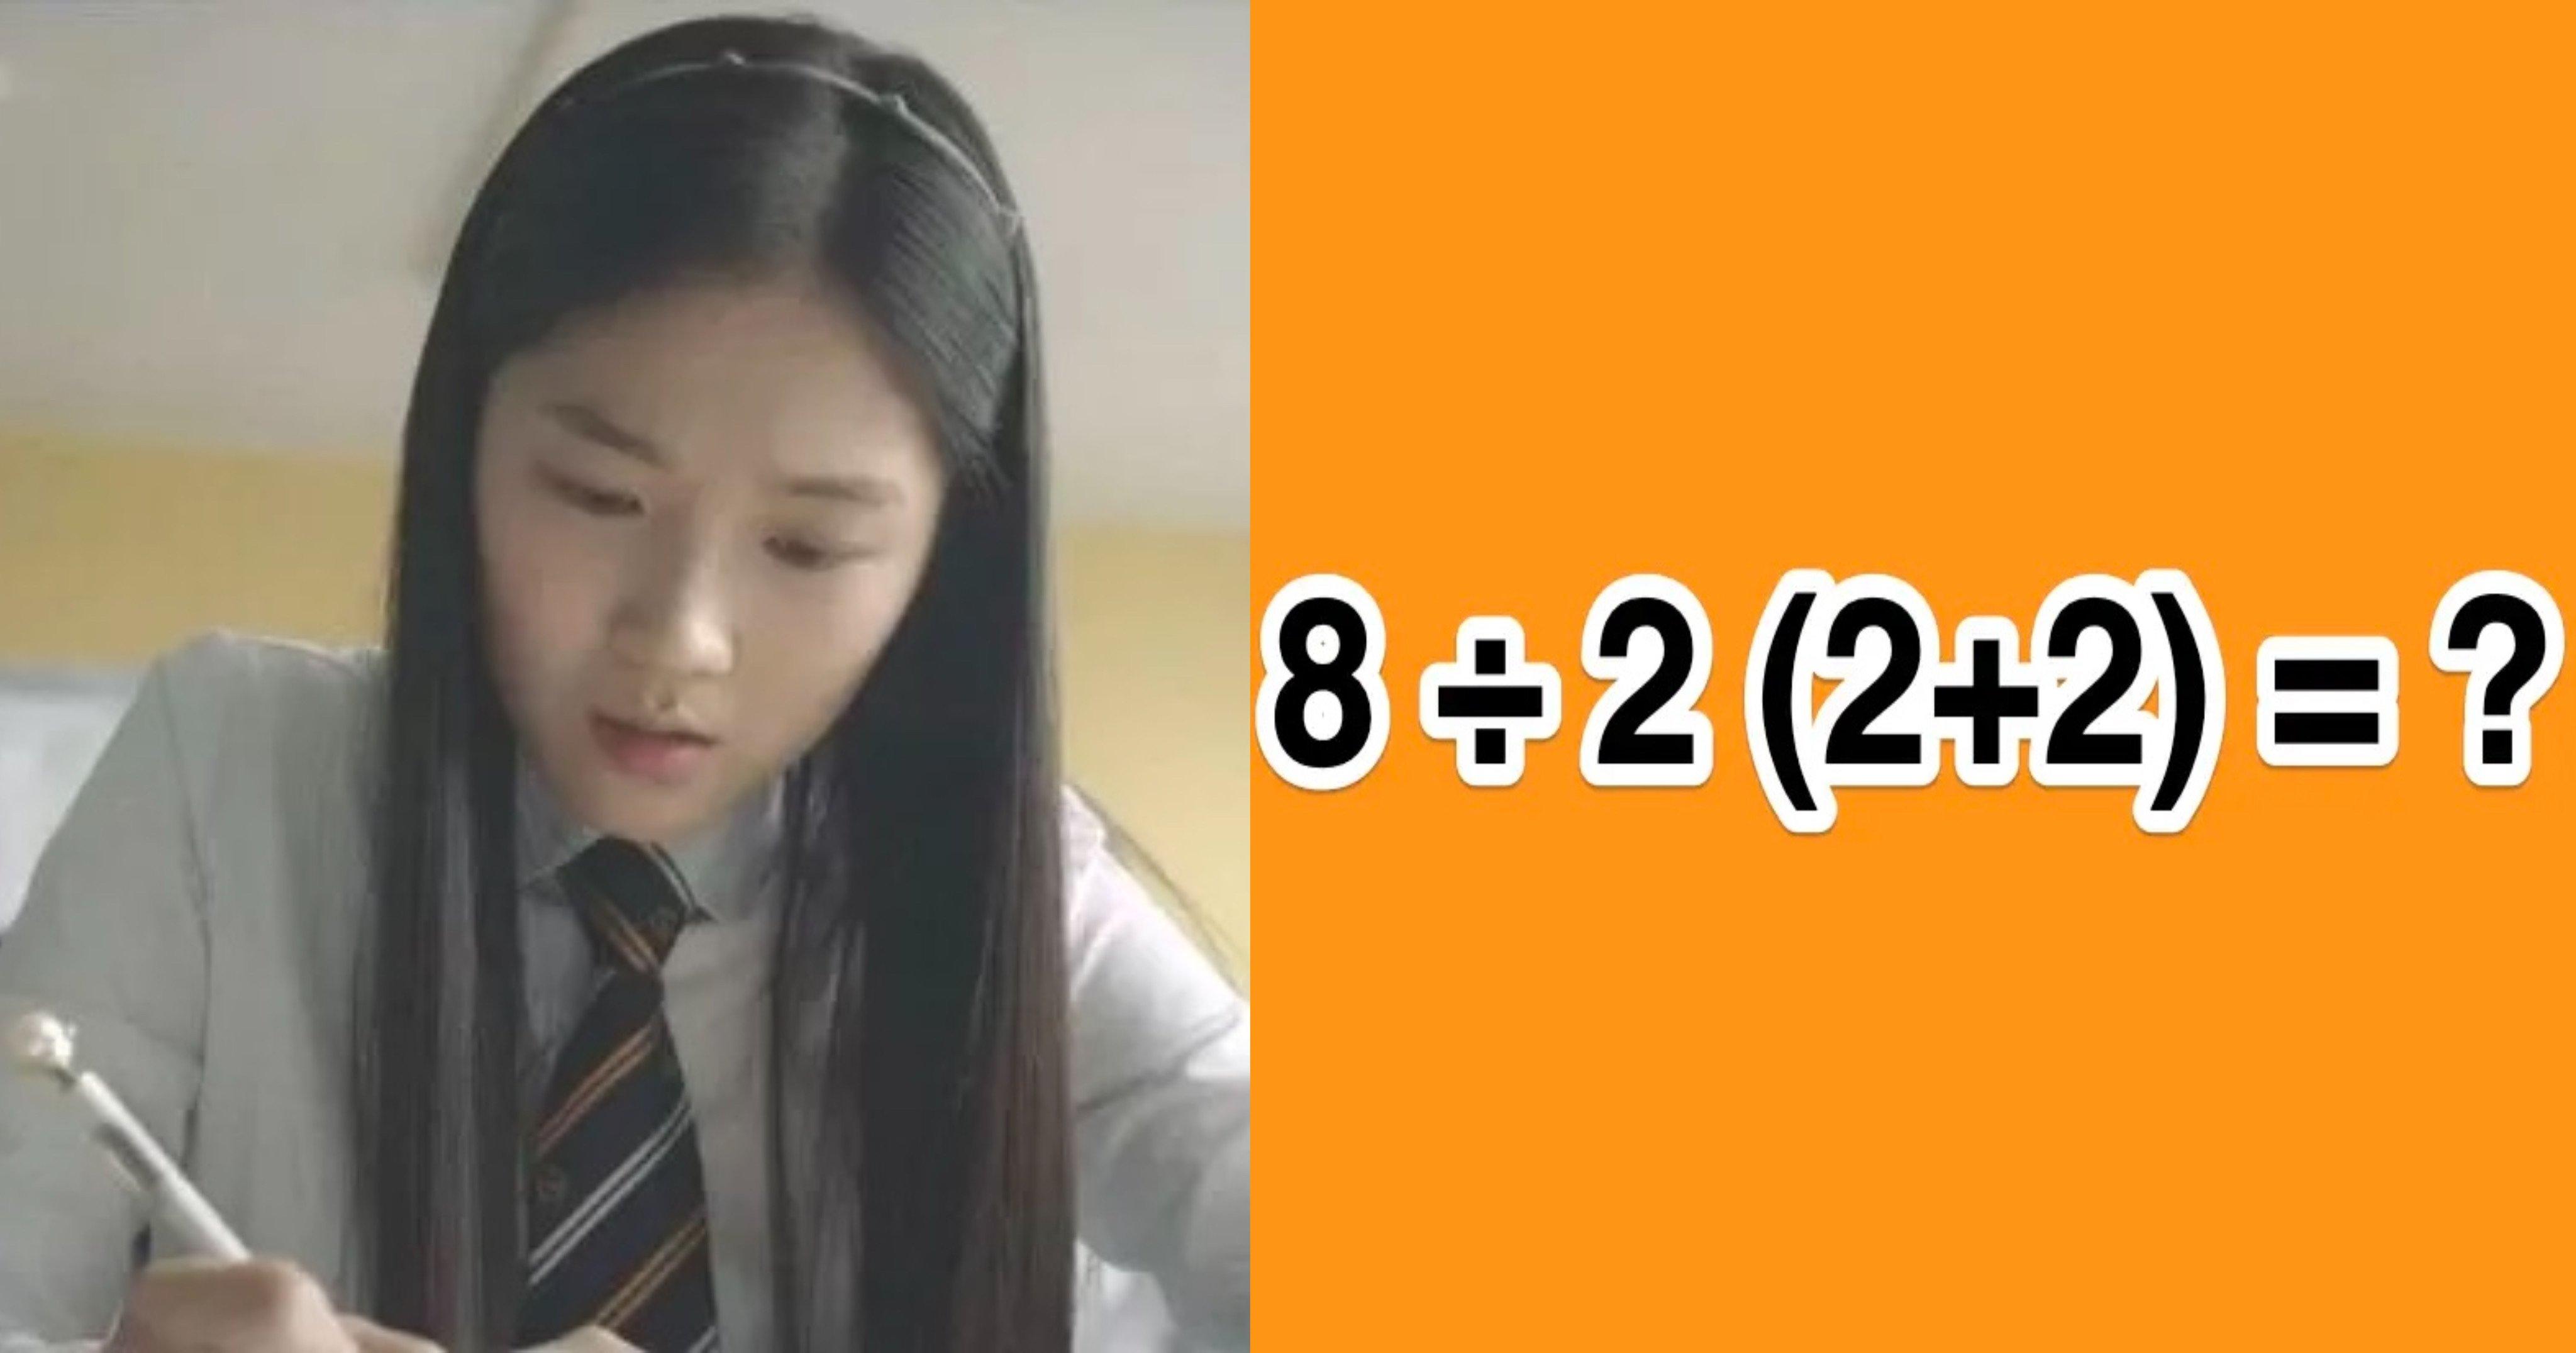 bdb6c556 8bff 414e b4e0 2312ea9c16e7.jpeg?resize=1200,630 - 「8÷2(2 + 2)=の答えは?」大人の半分が間違うという騒がれている問題の答え